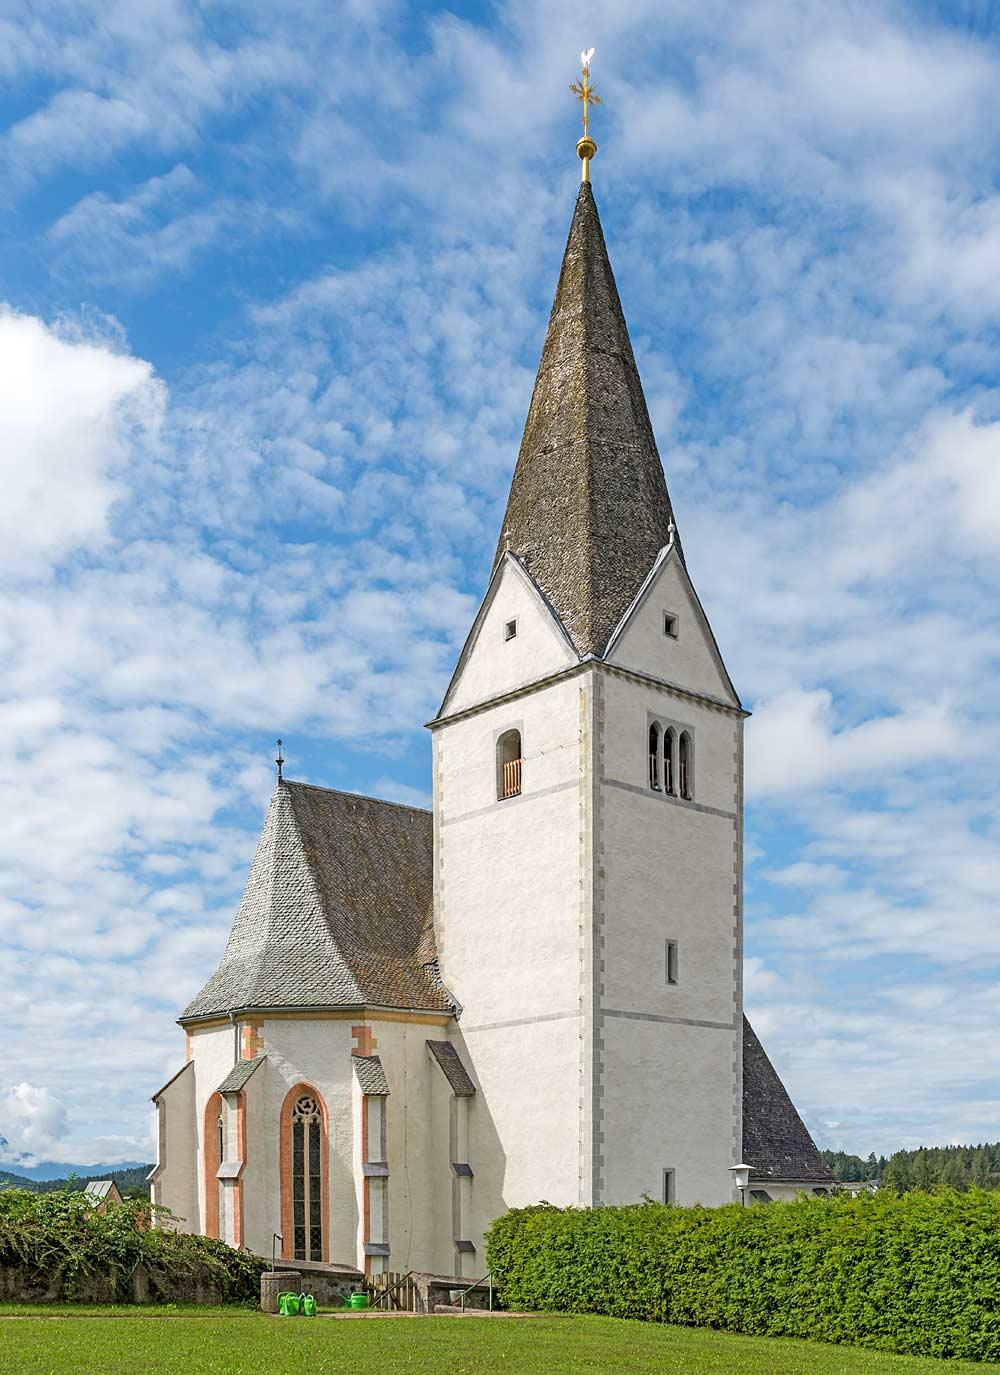 Pfarrkirche St. Maria Magdalena in Ruden